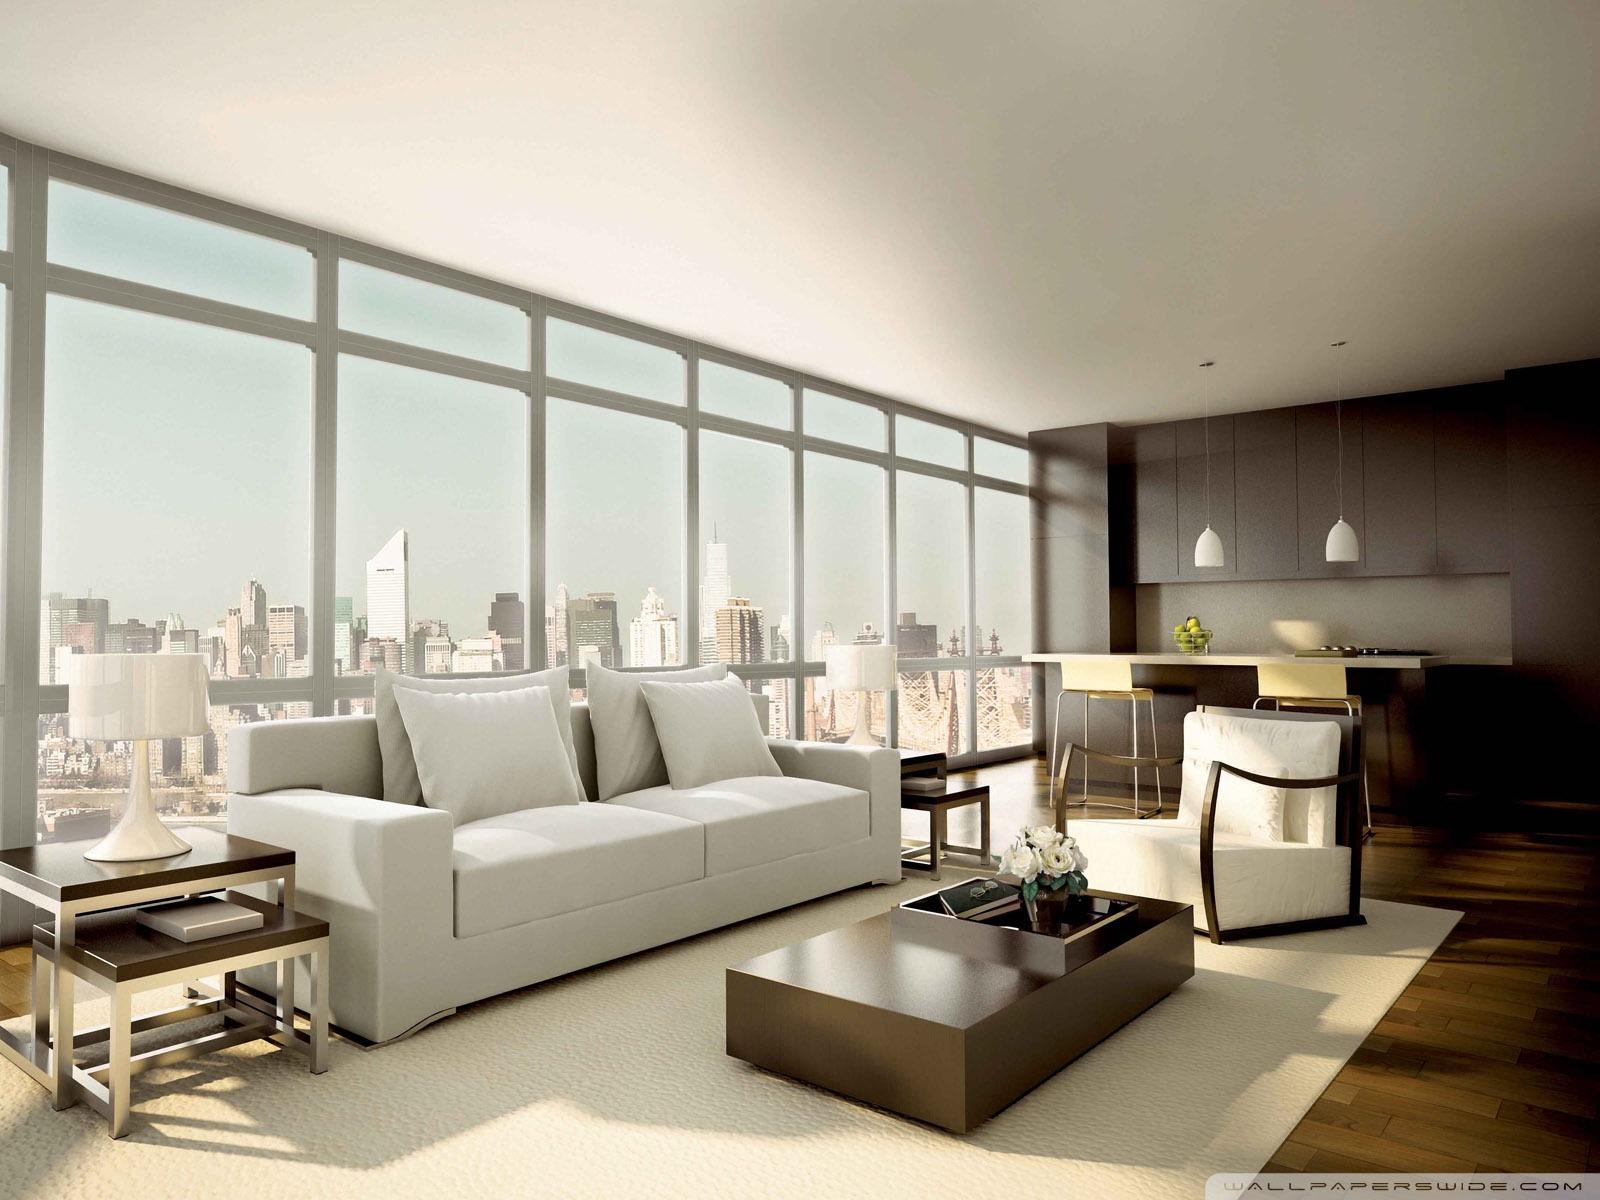 Captivating Photography / Interior Design Architecture Decoration Landsc.